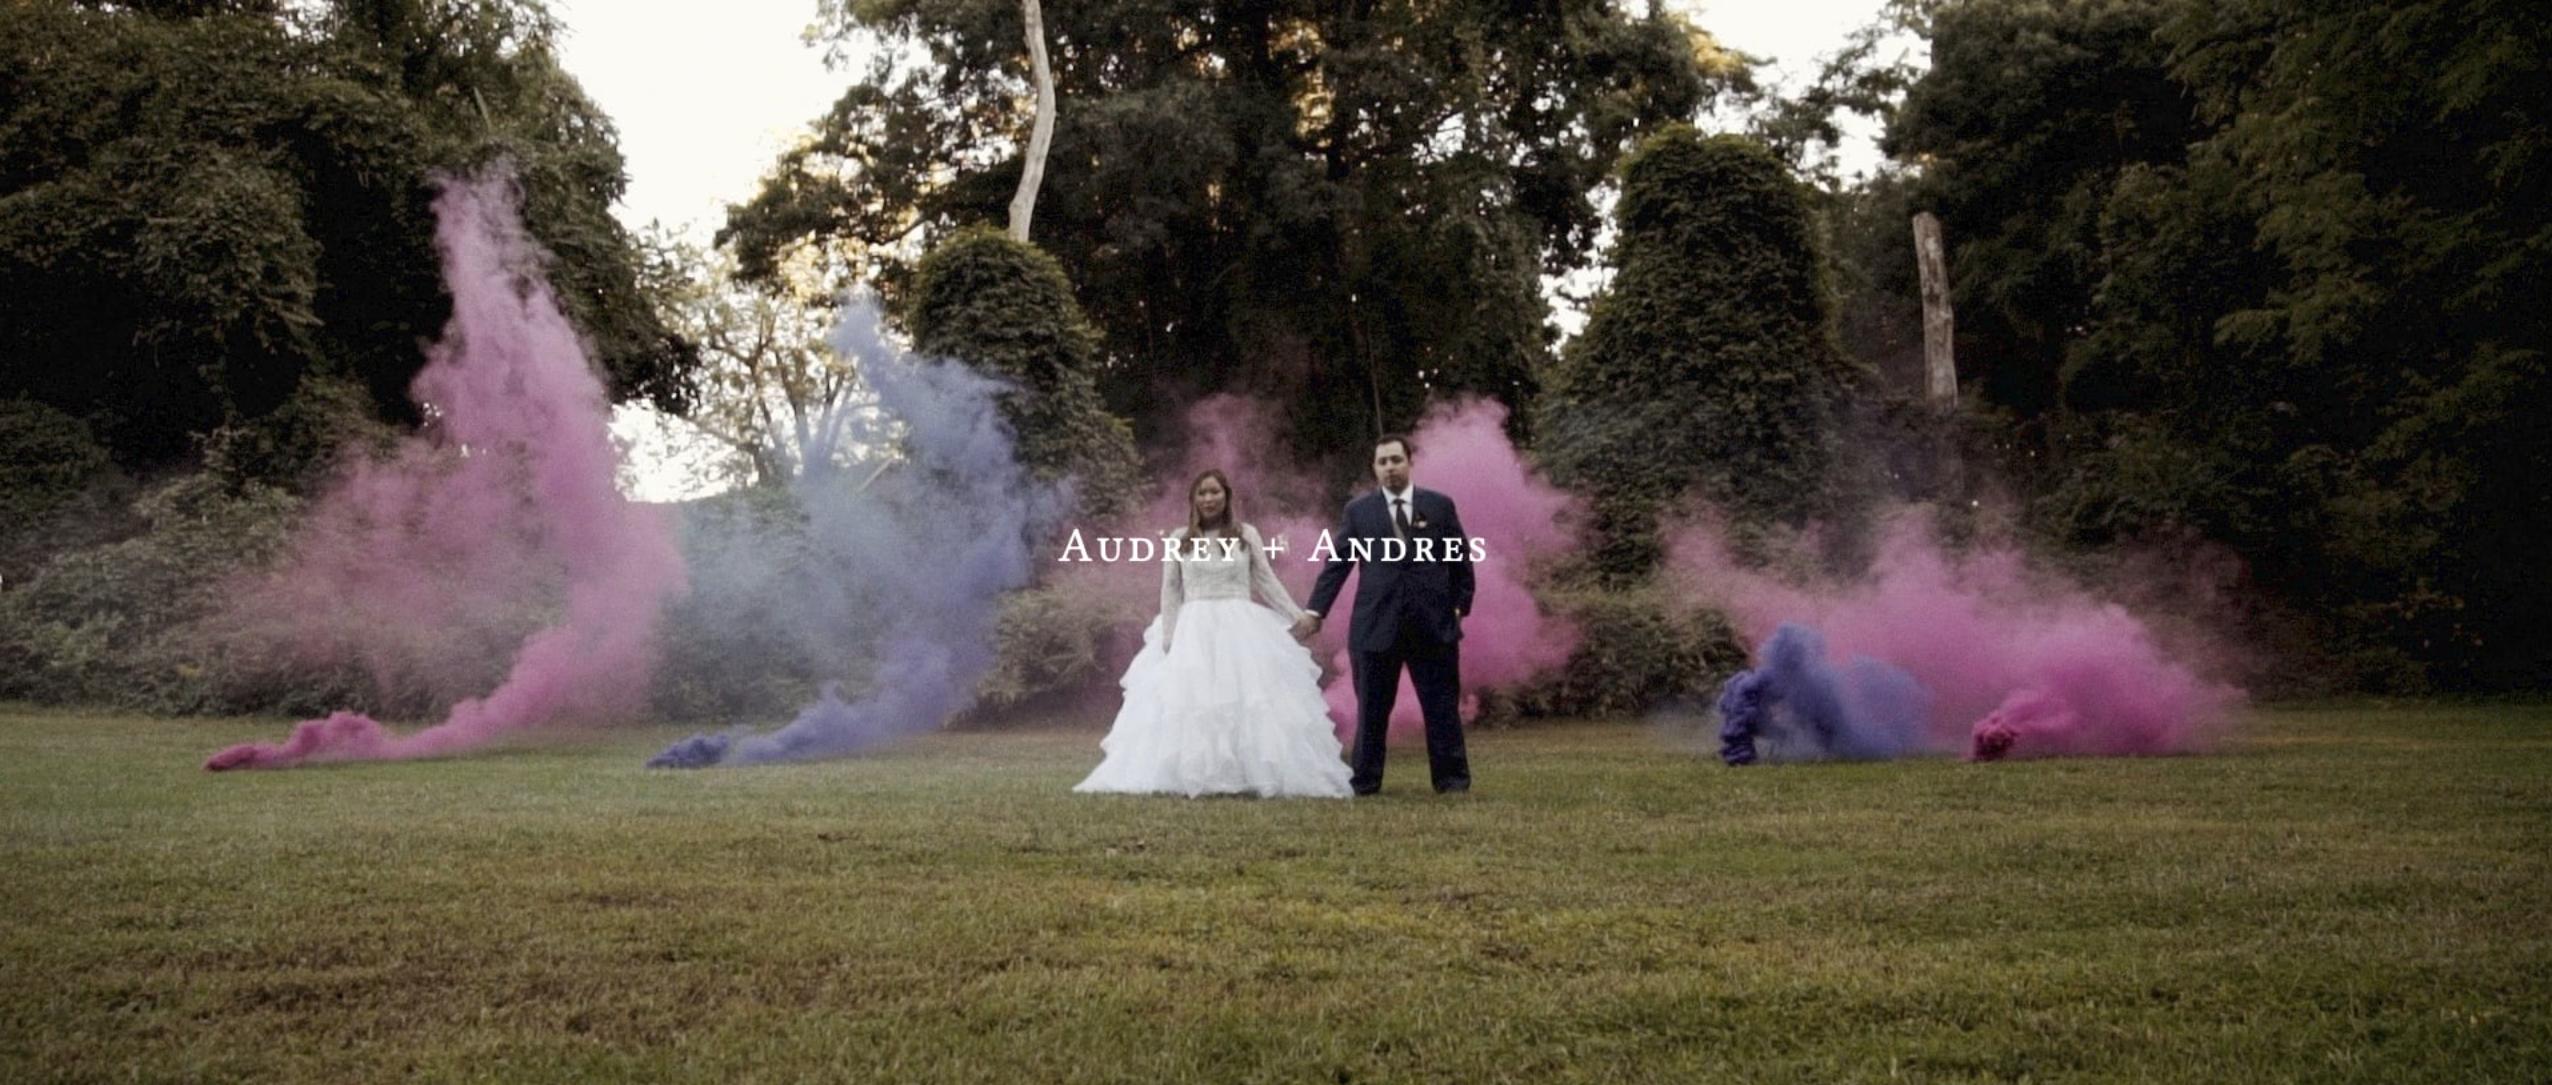 Audrey + Andres | Woodbury, New York | inn at fox hollow